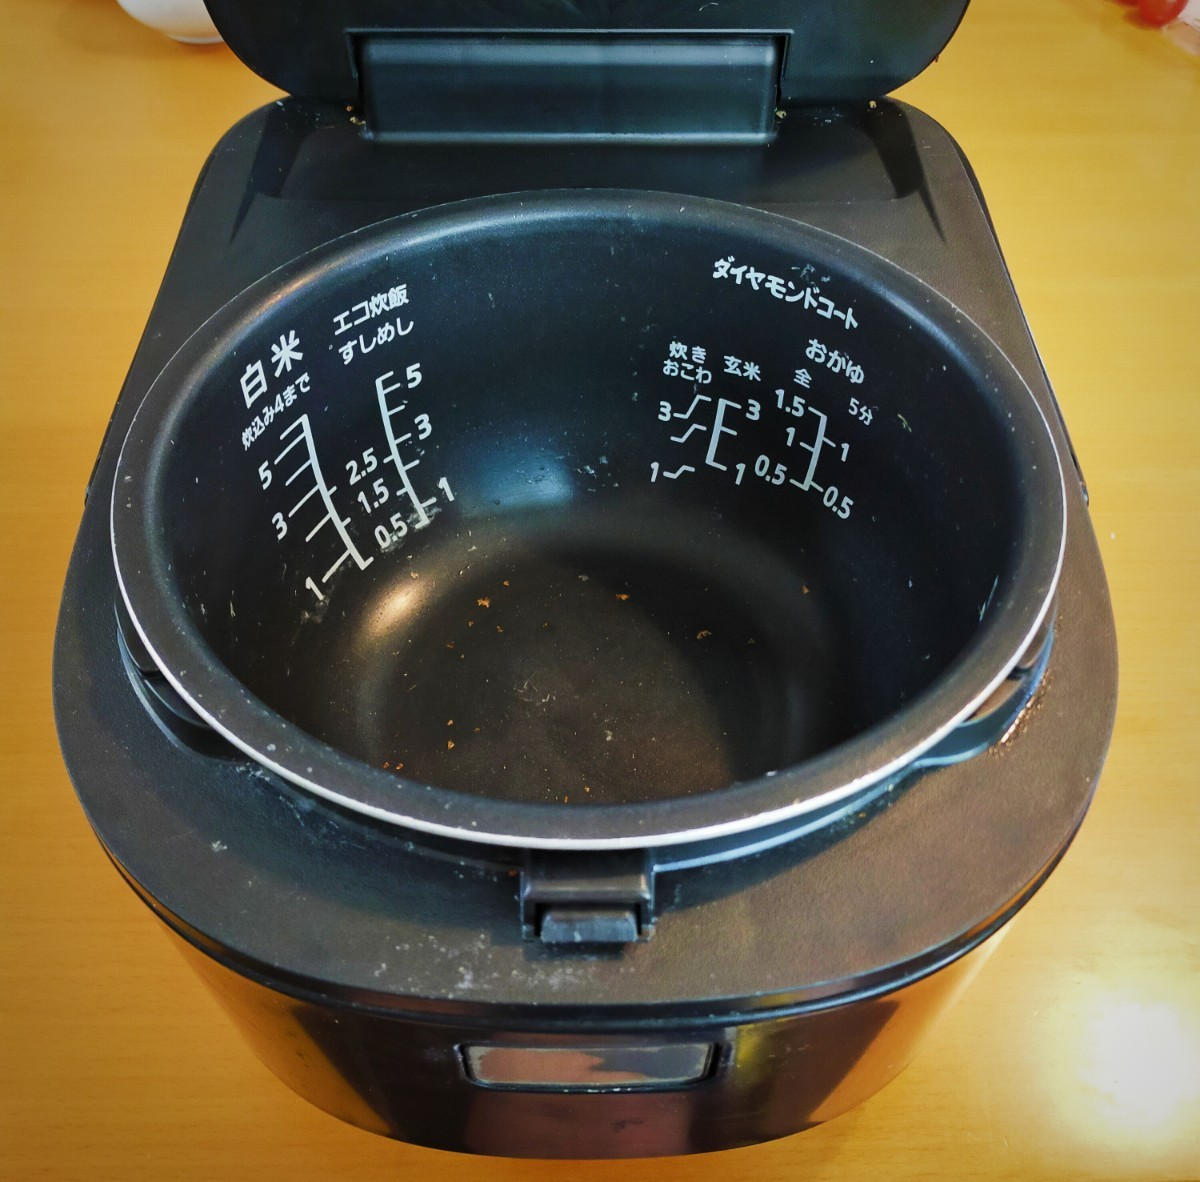 IHジャー炊飯器品番SRHB101  Panasonic 銅釜  IH炊飯ジャー  1リットル炊飯量